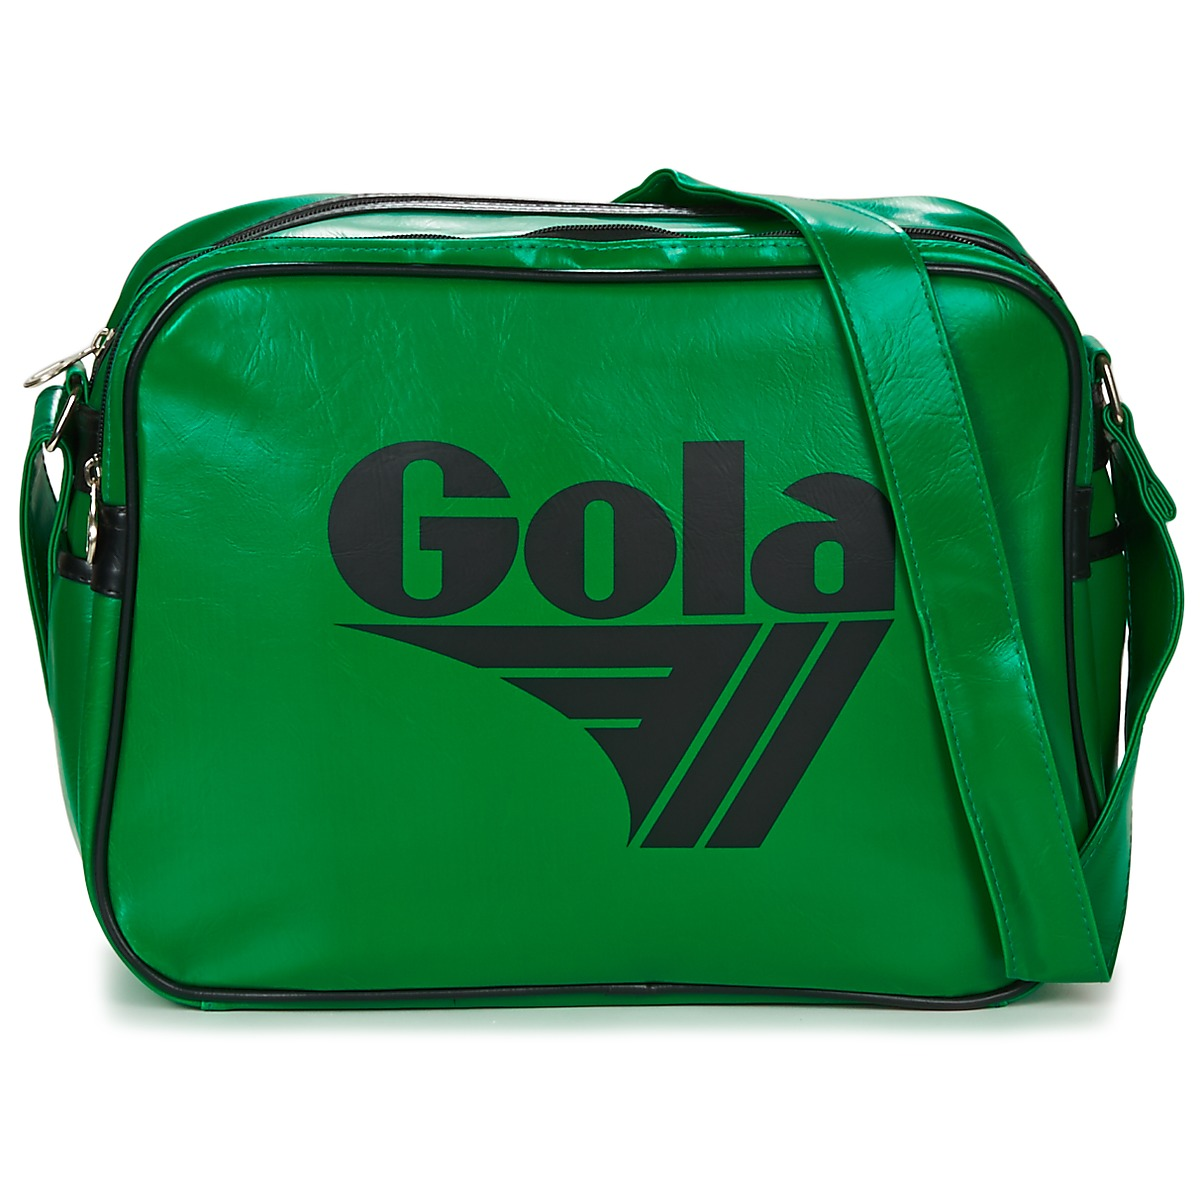 Borse bisacce donna Gola  REDFORD ALT  Verde